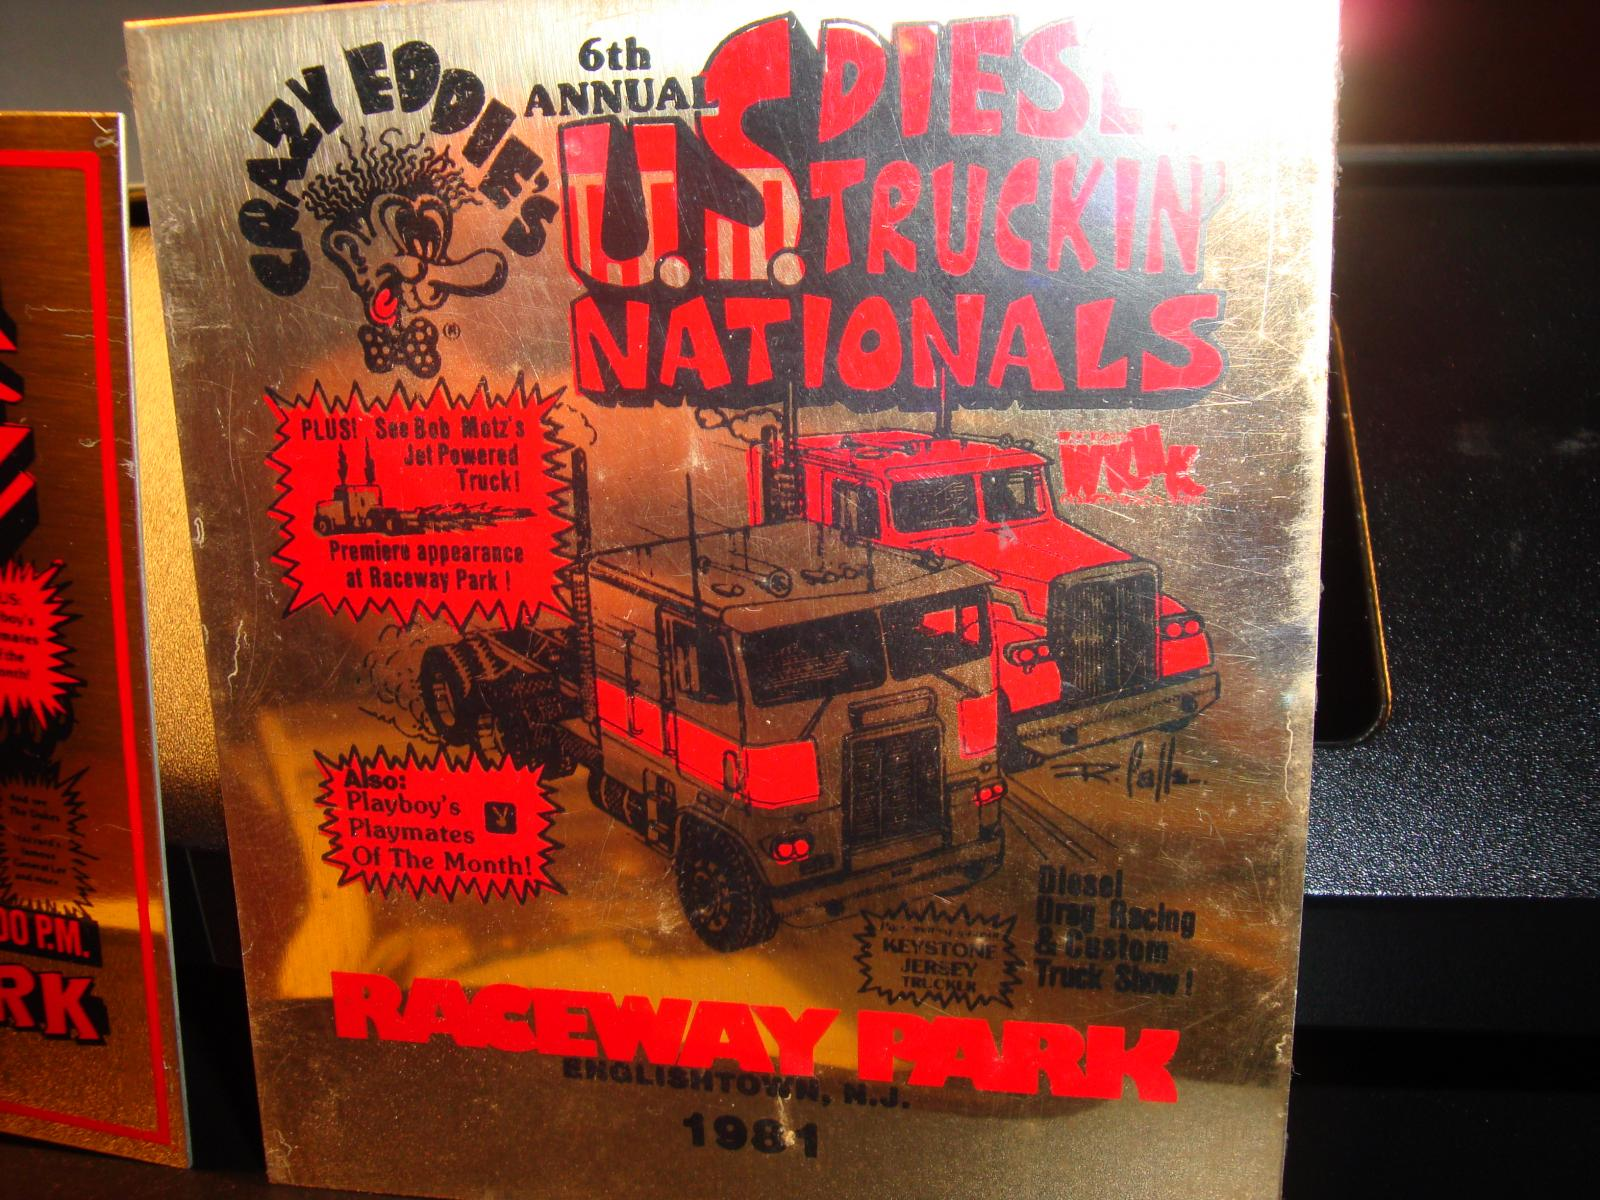 '49 EE taking break / englishtown races '82